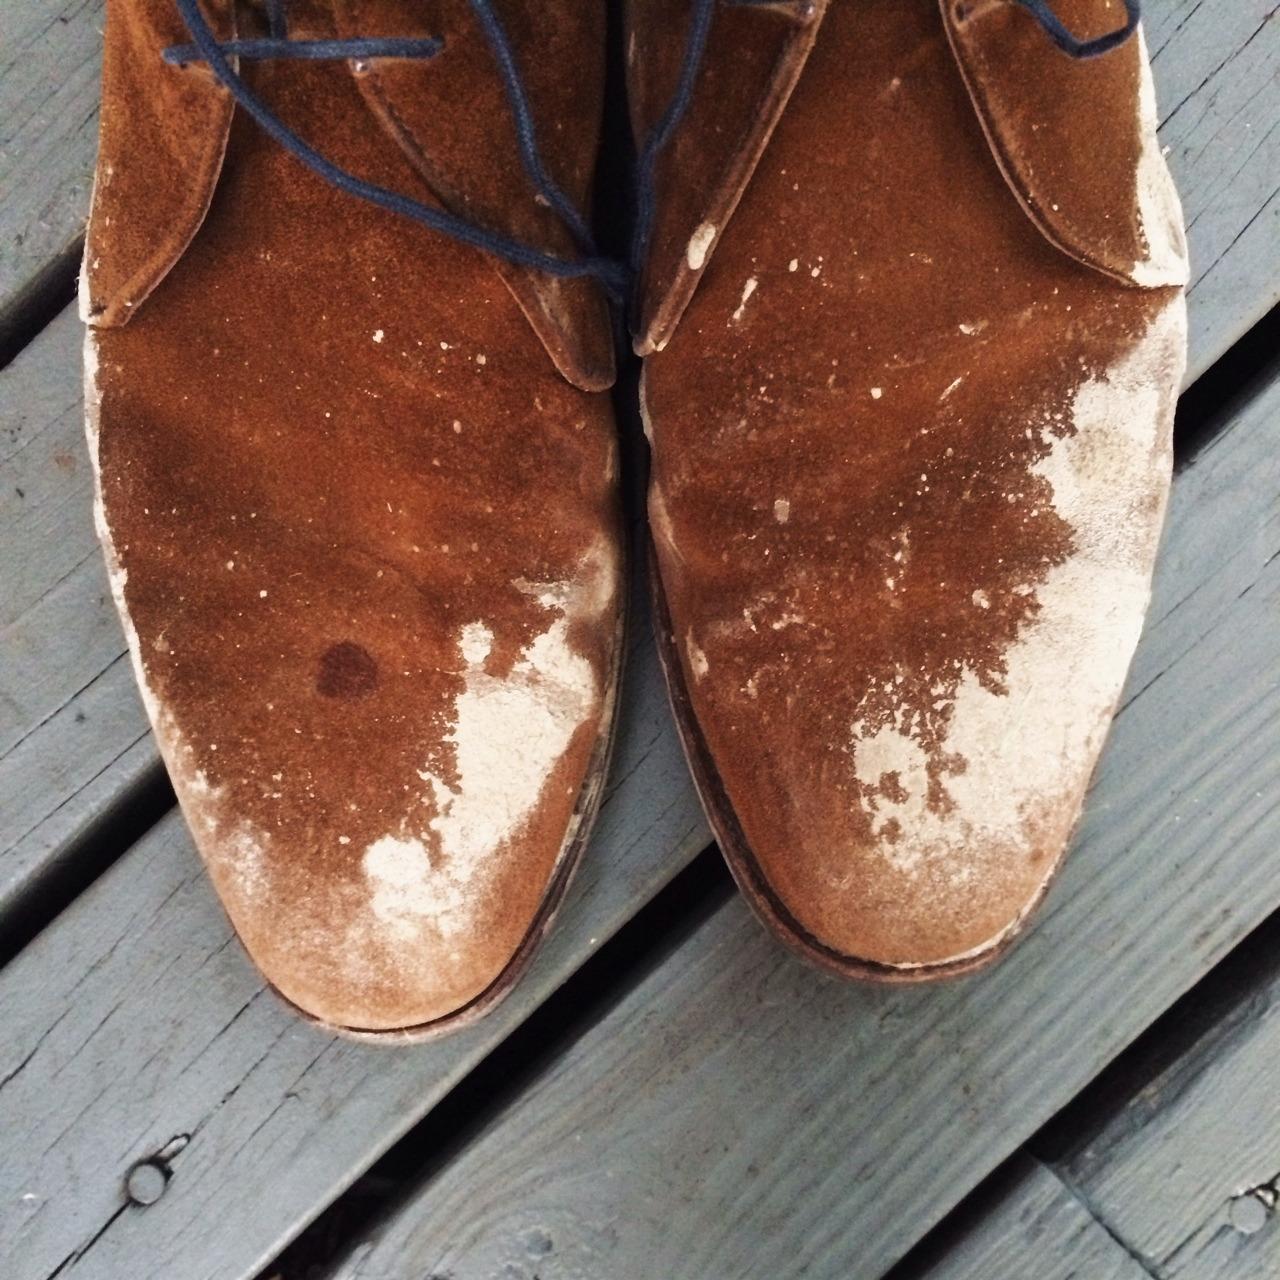 Please Mistreat Your Suede Shoes